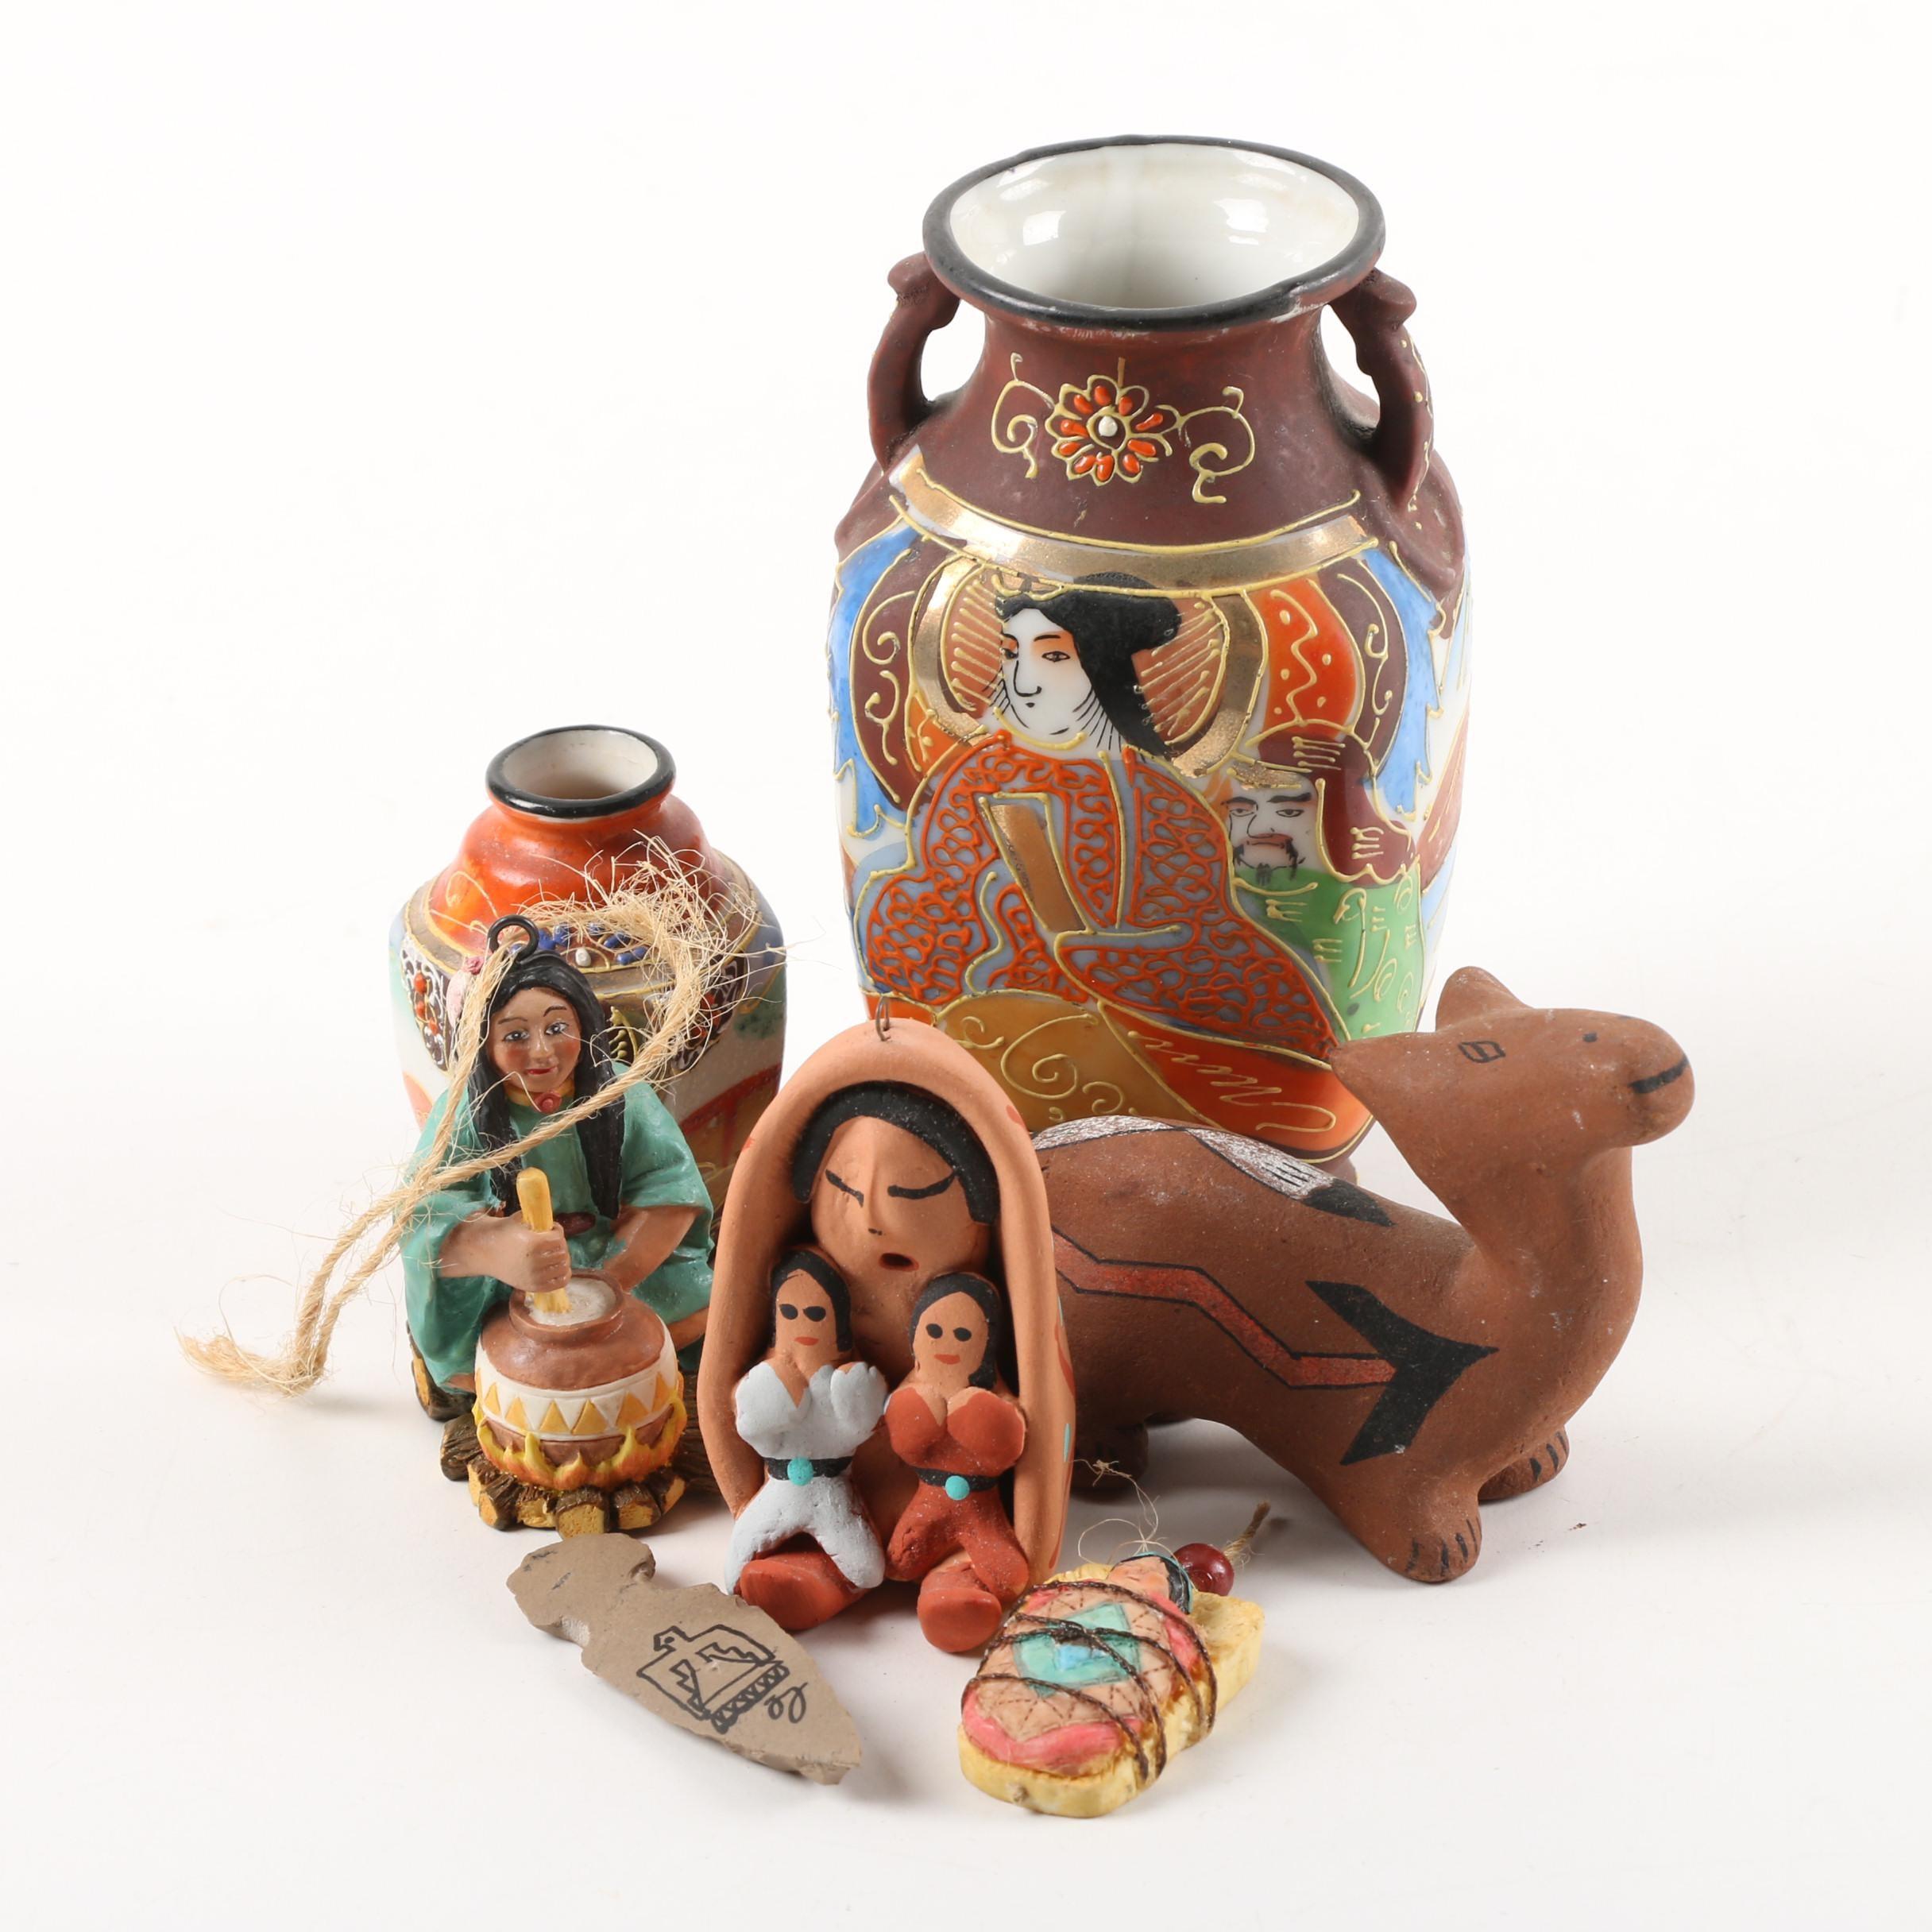 Vintage Porcelain Vases, Ceramic Figurines and Ornaments